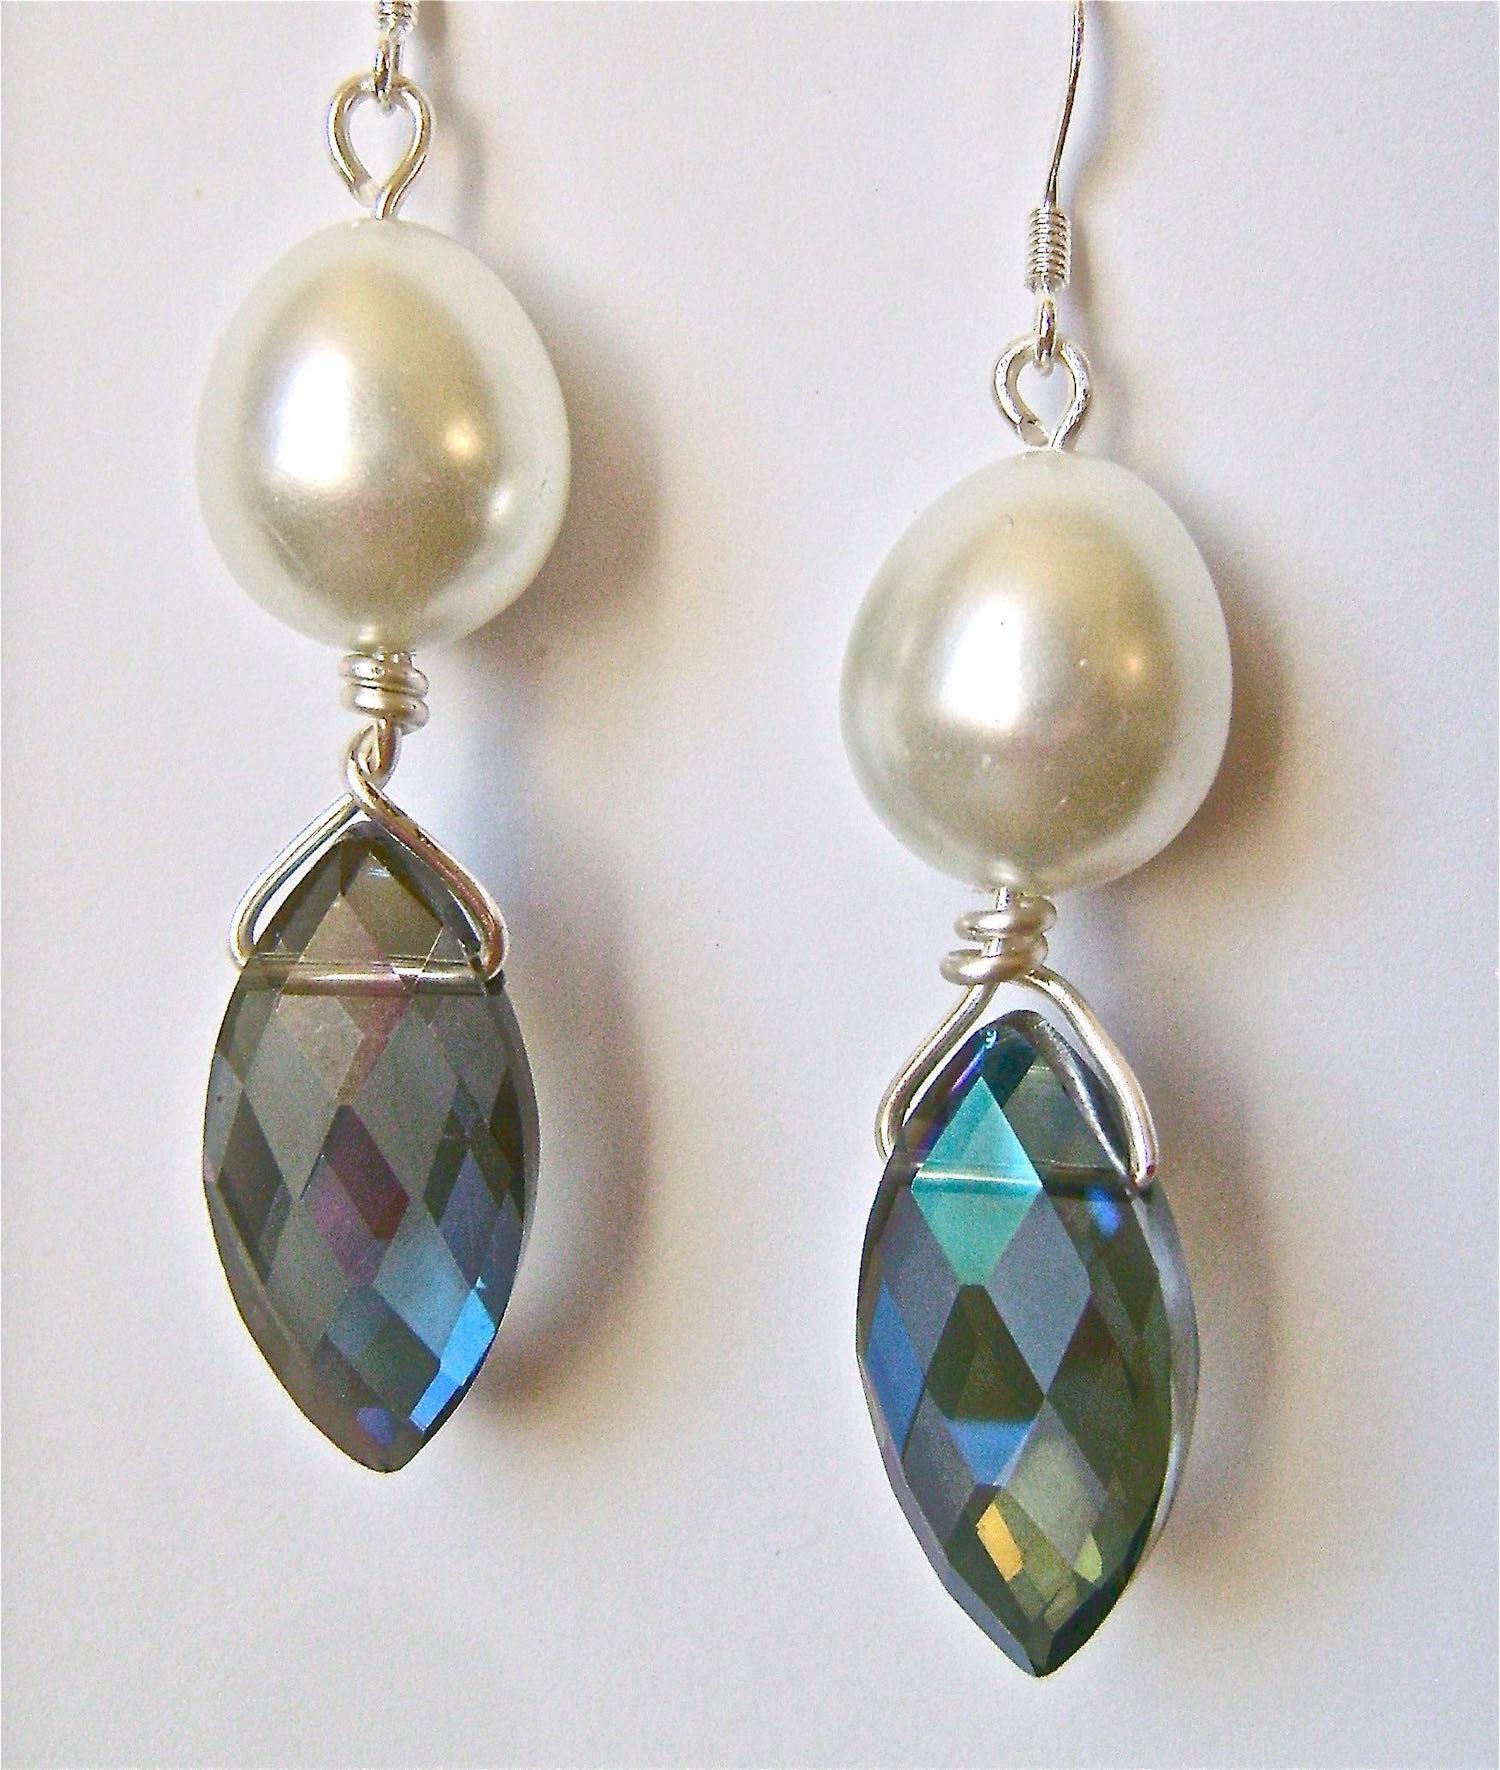 "earrings measure 2.25"" long"